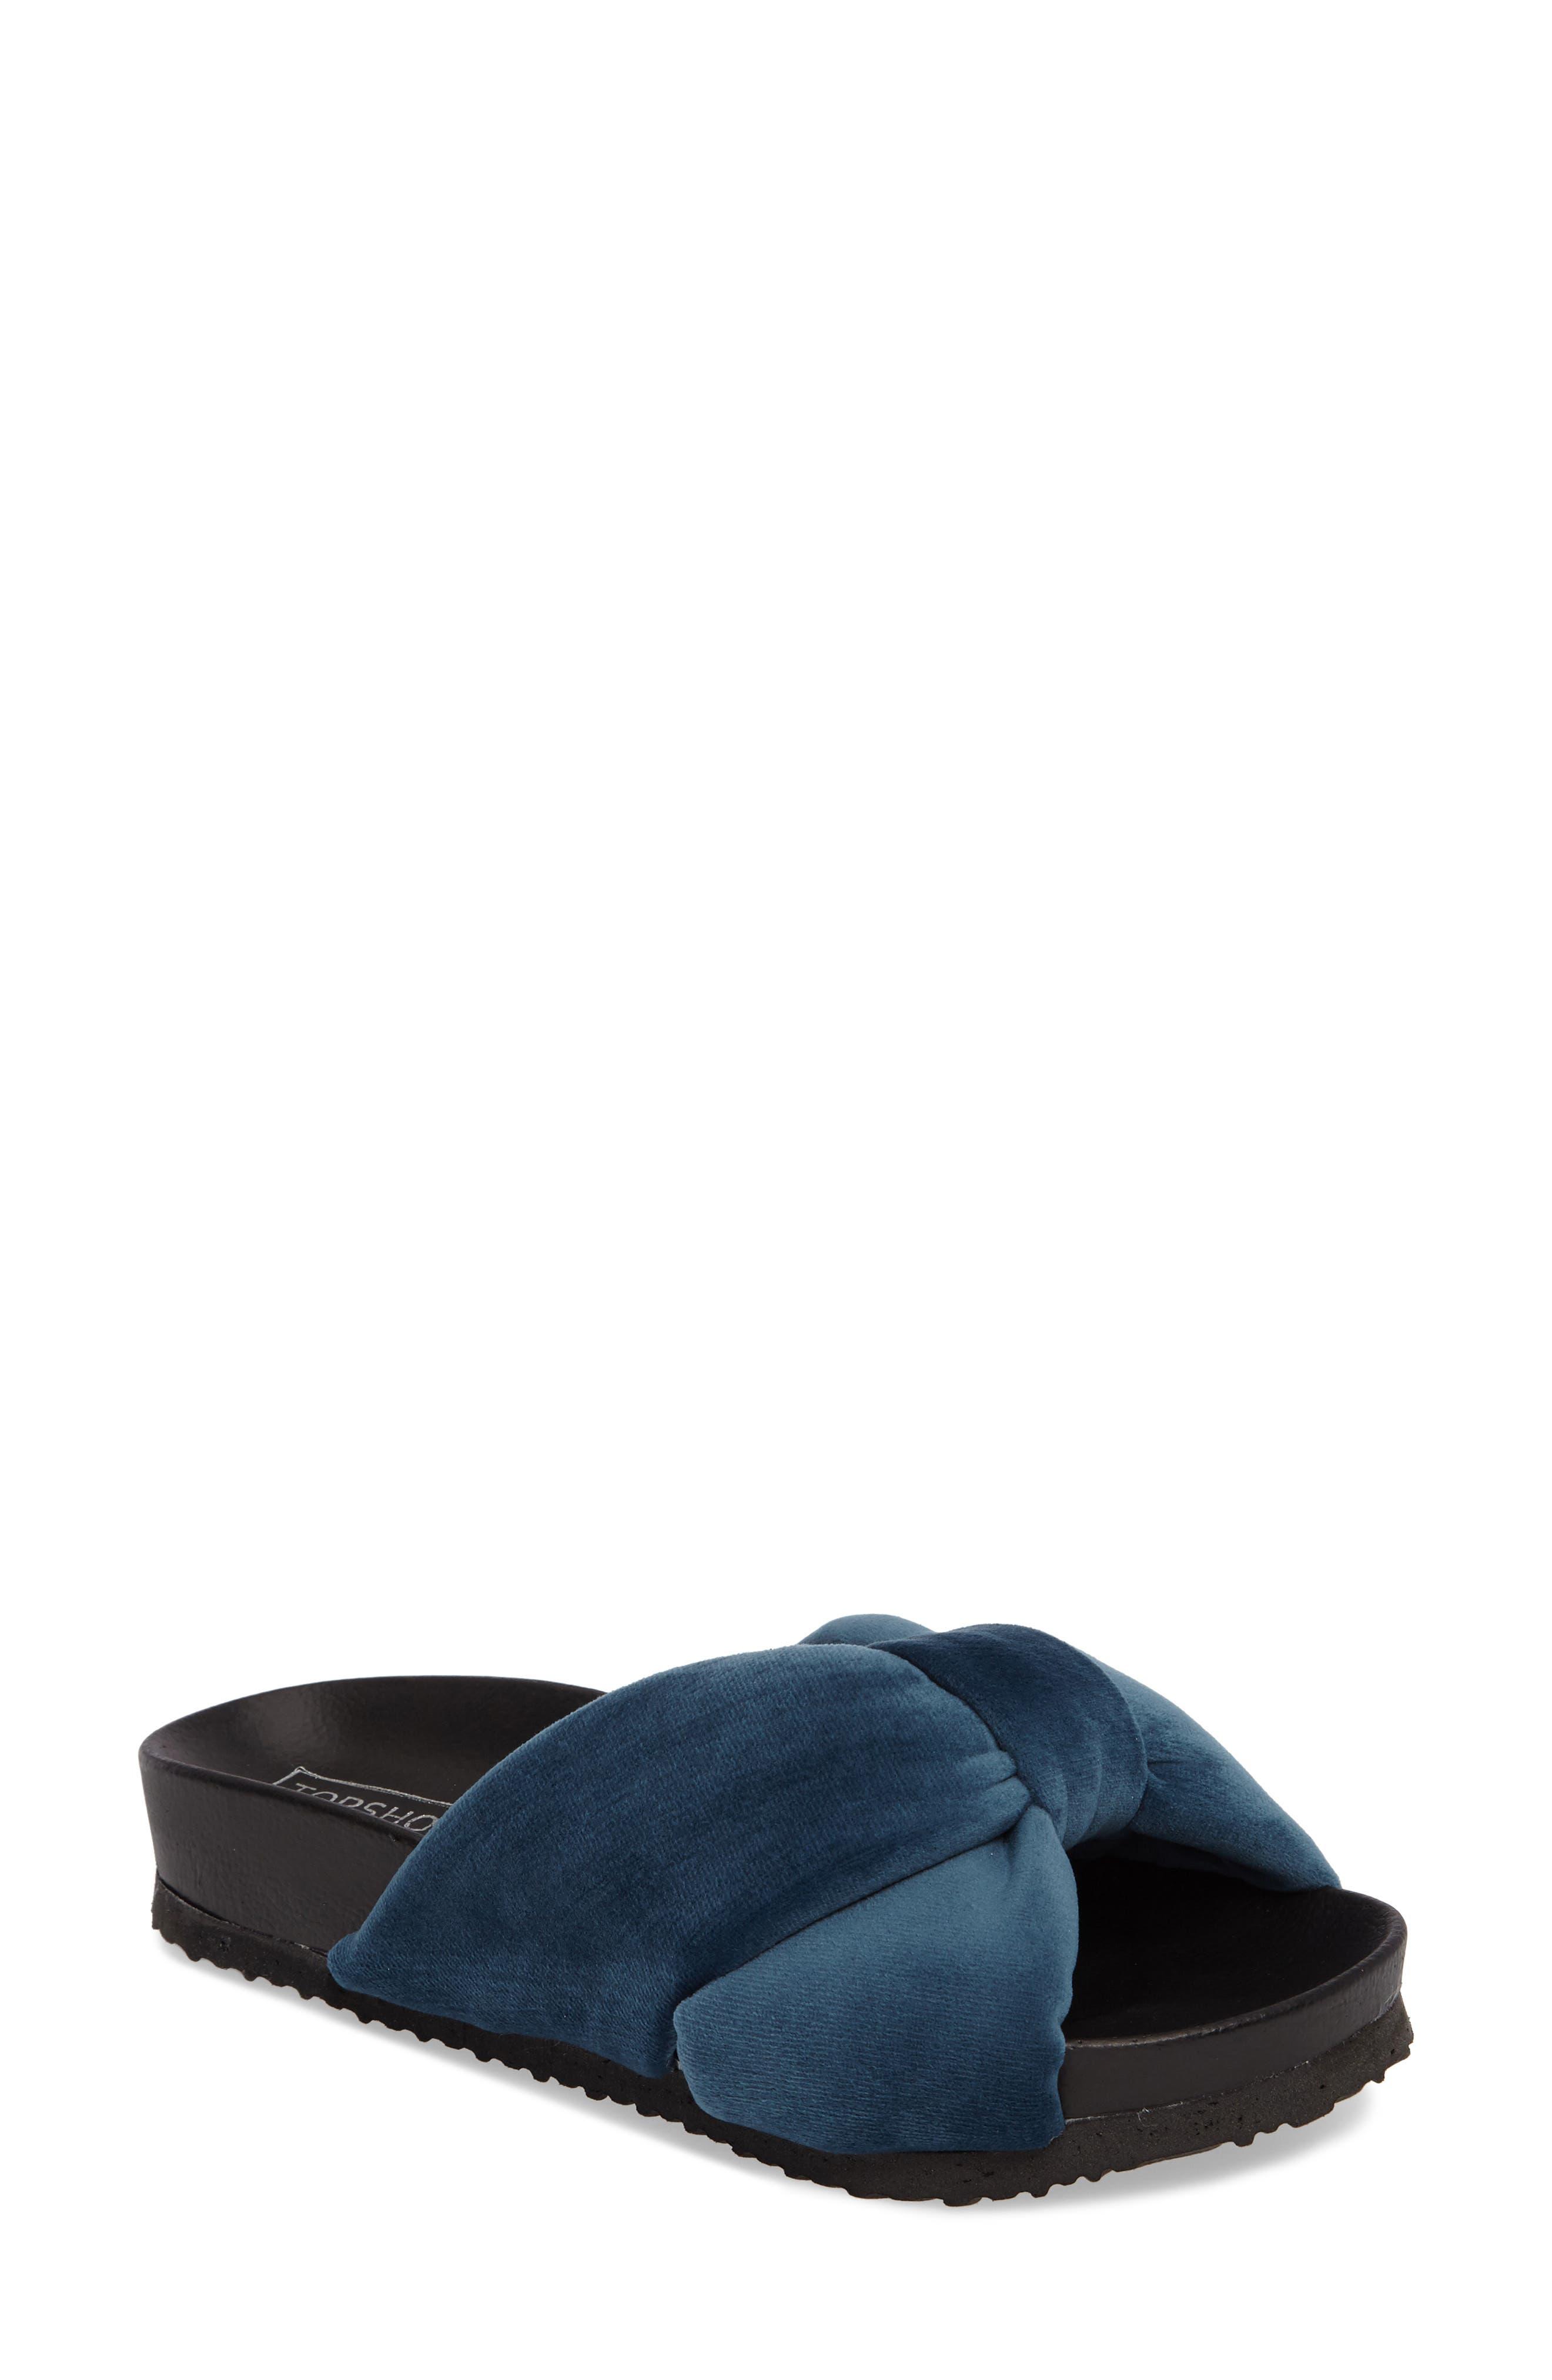 Alternate Image 1 Selected - Topshop Fly Knot Slide Sandal (Women)